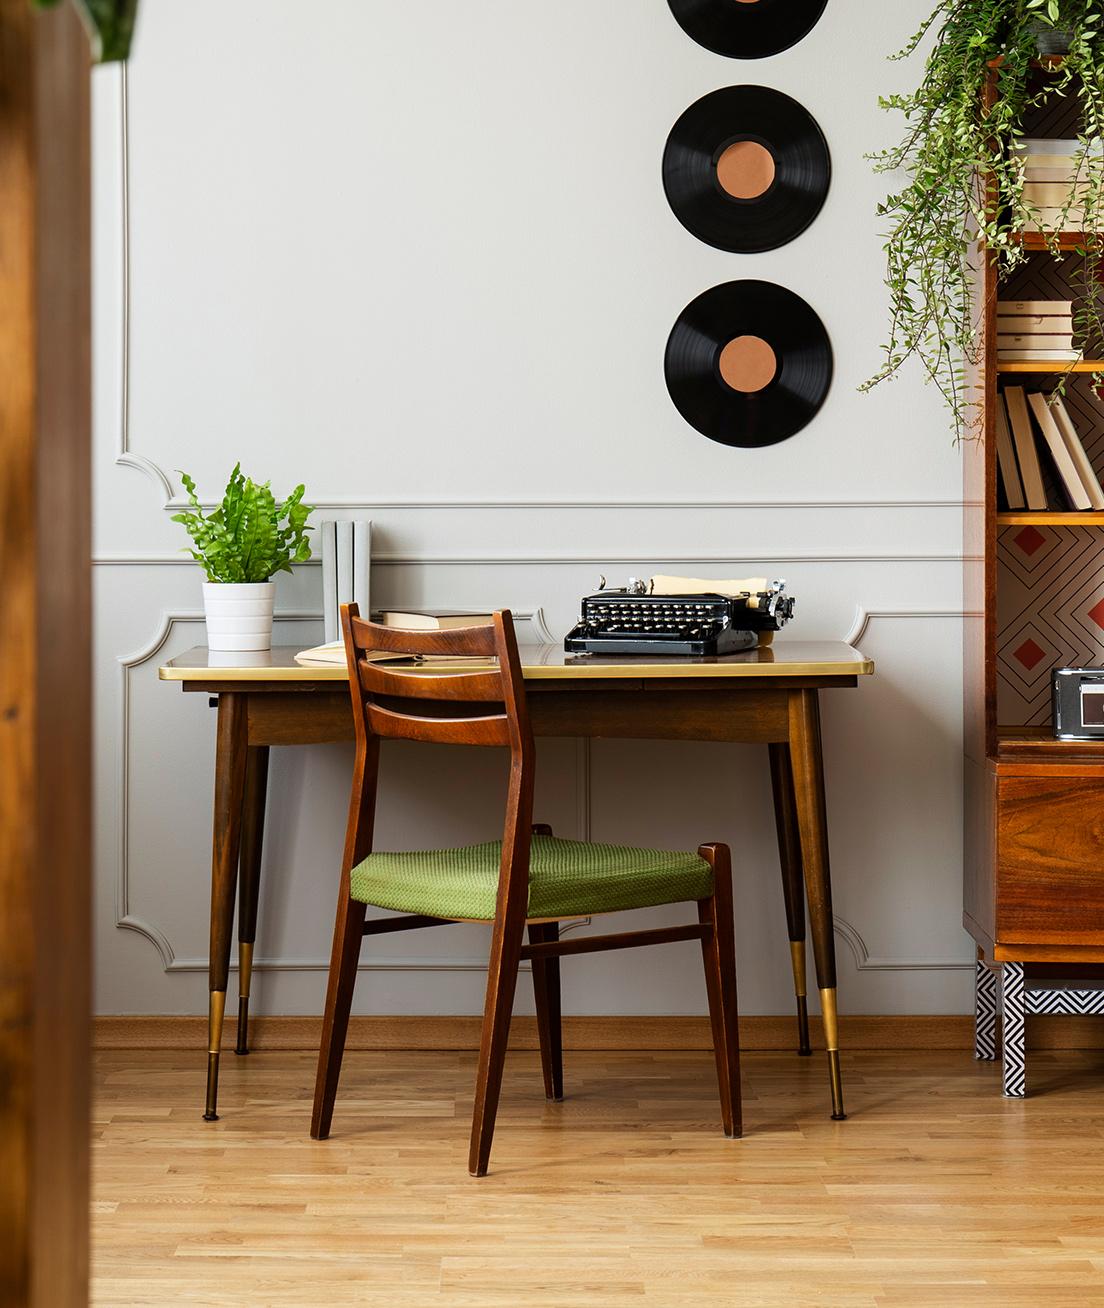 Wooden writing desk with typewriter.